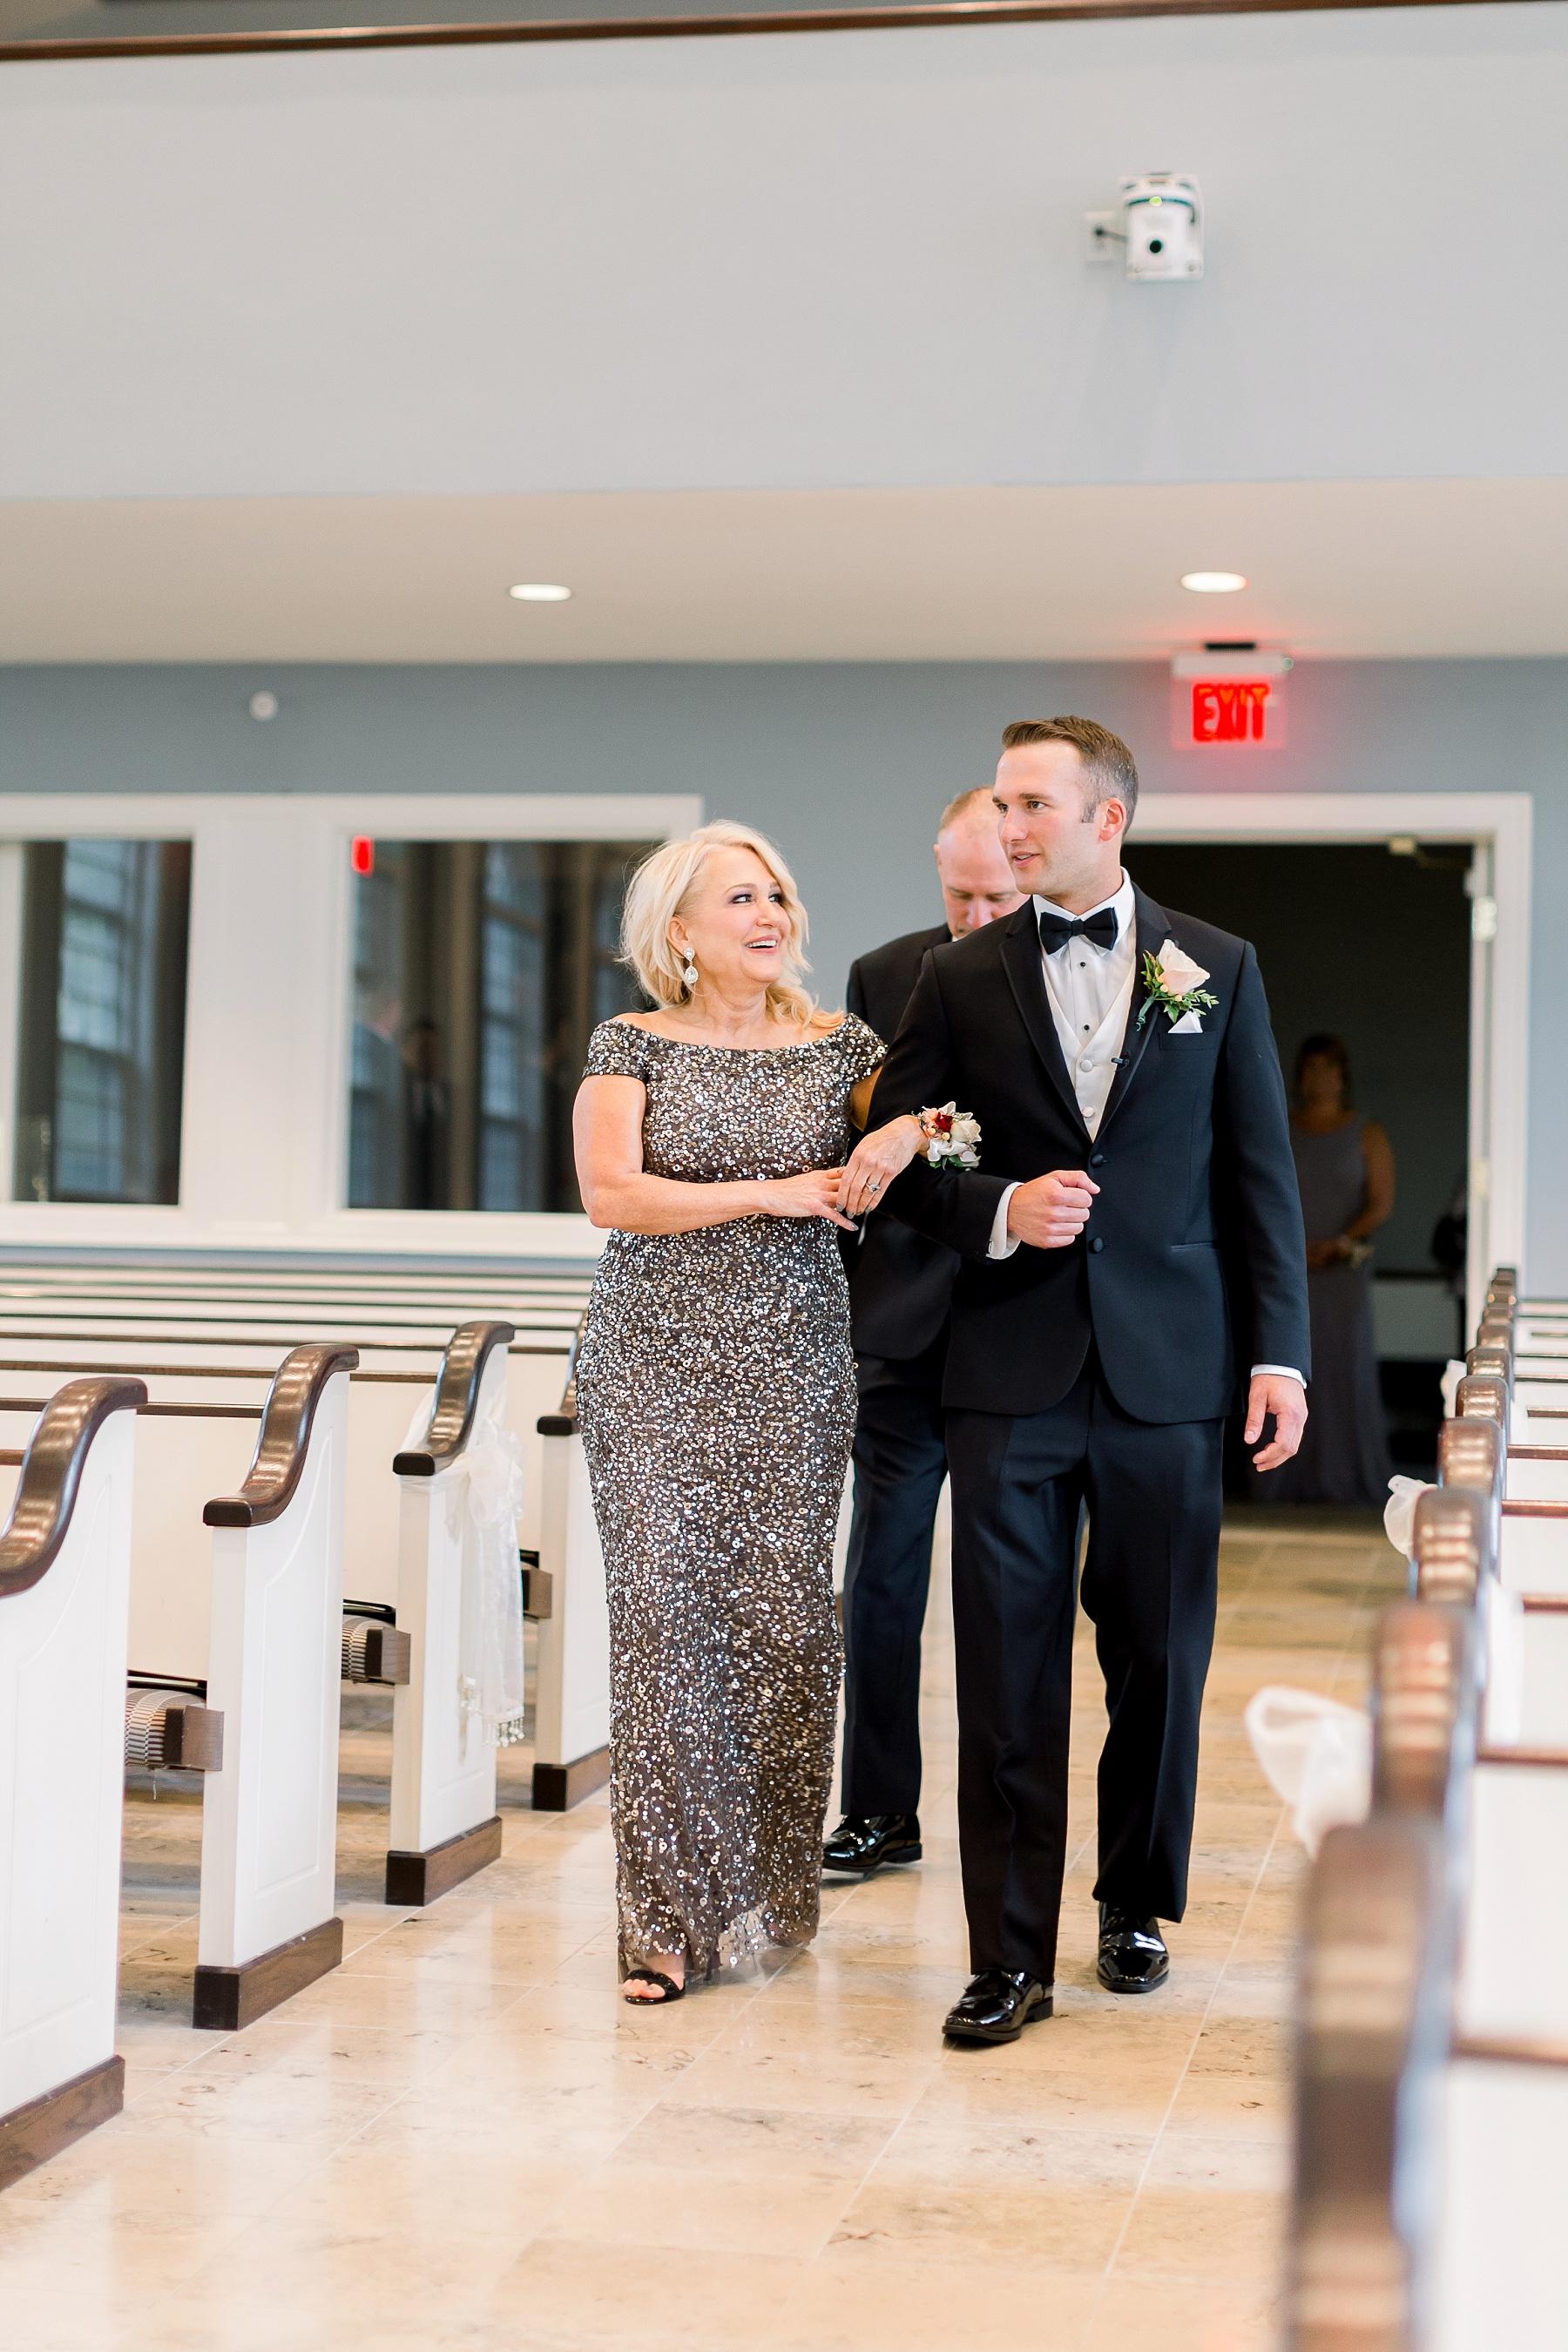 midwest-adventurous-wedding-photographer-elizabeth-ladean-photography-photo_4739.jpg